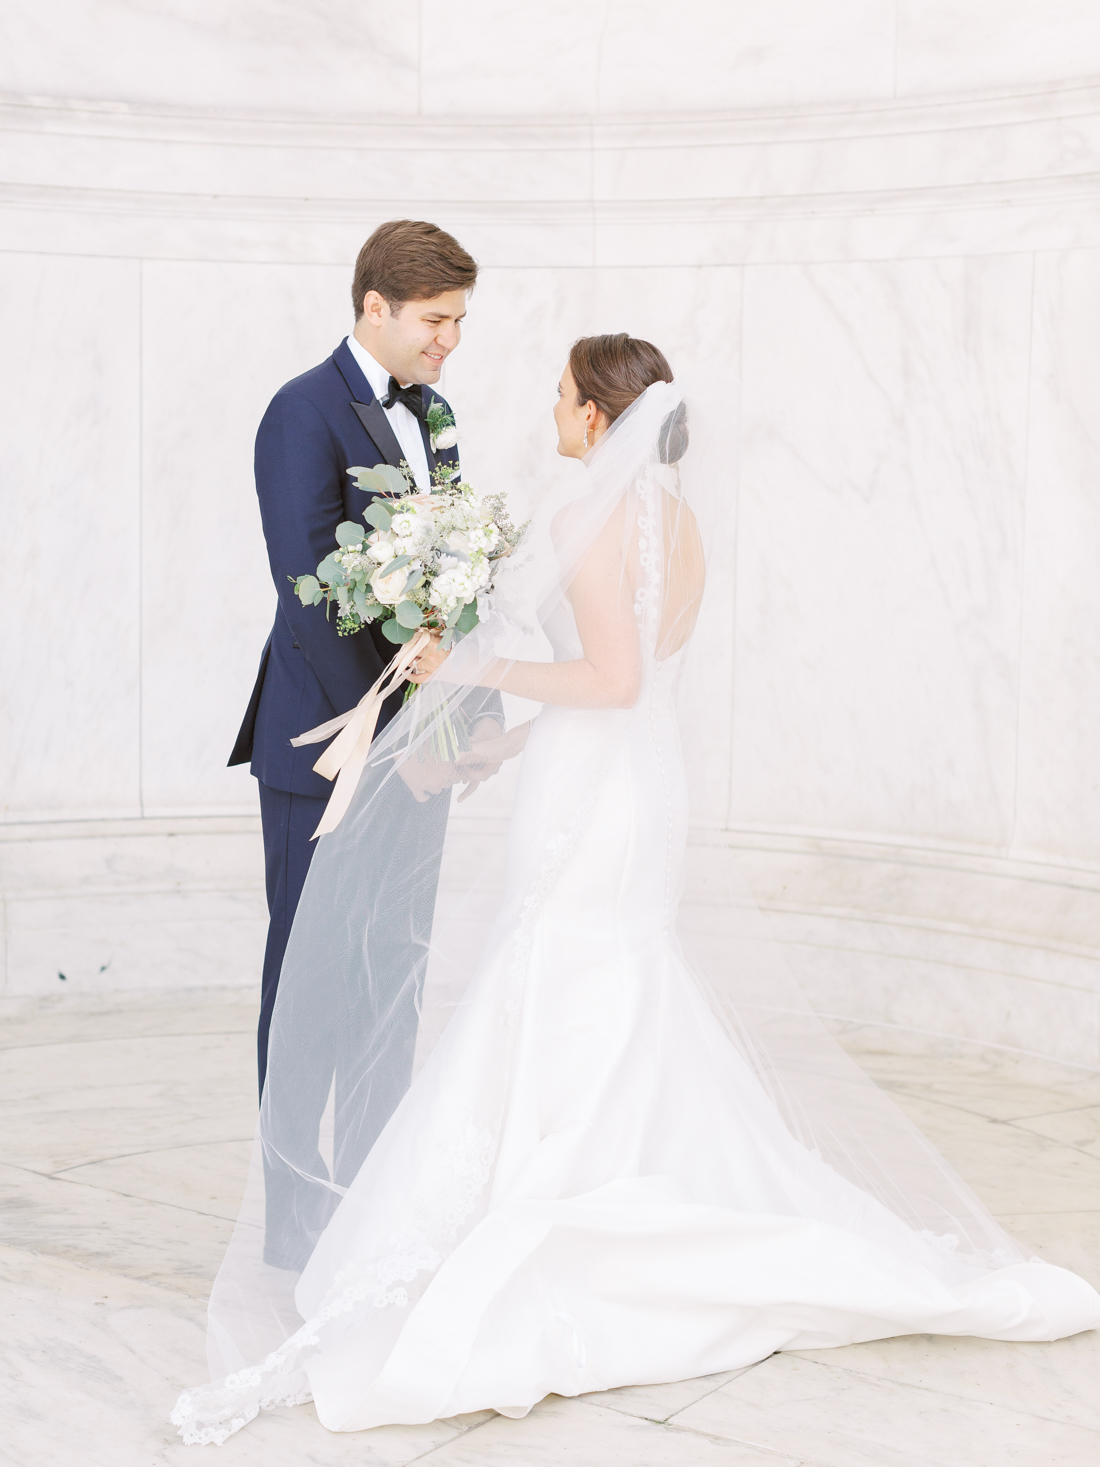 Jefferson-memorial-wedding-washington-dc